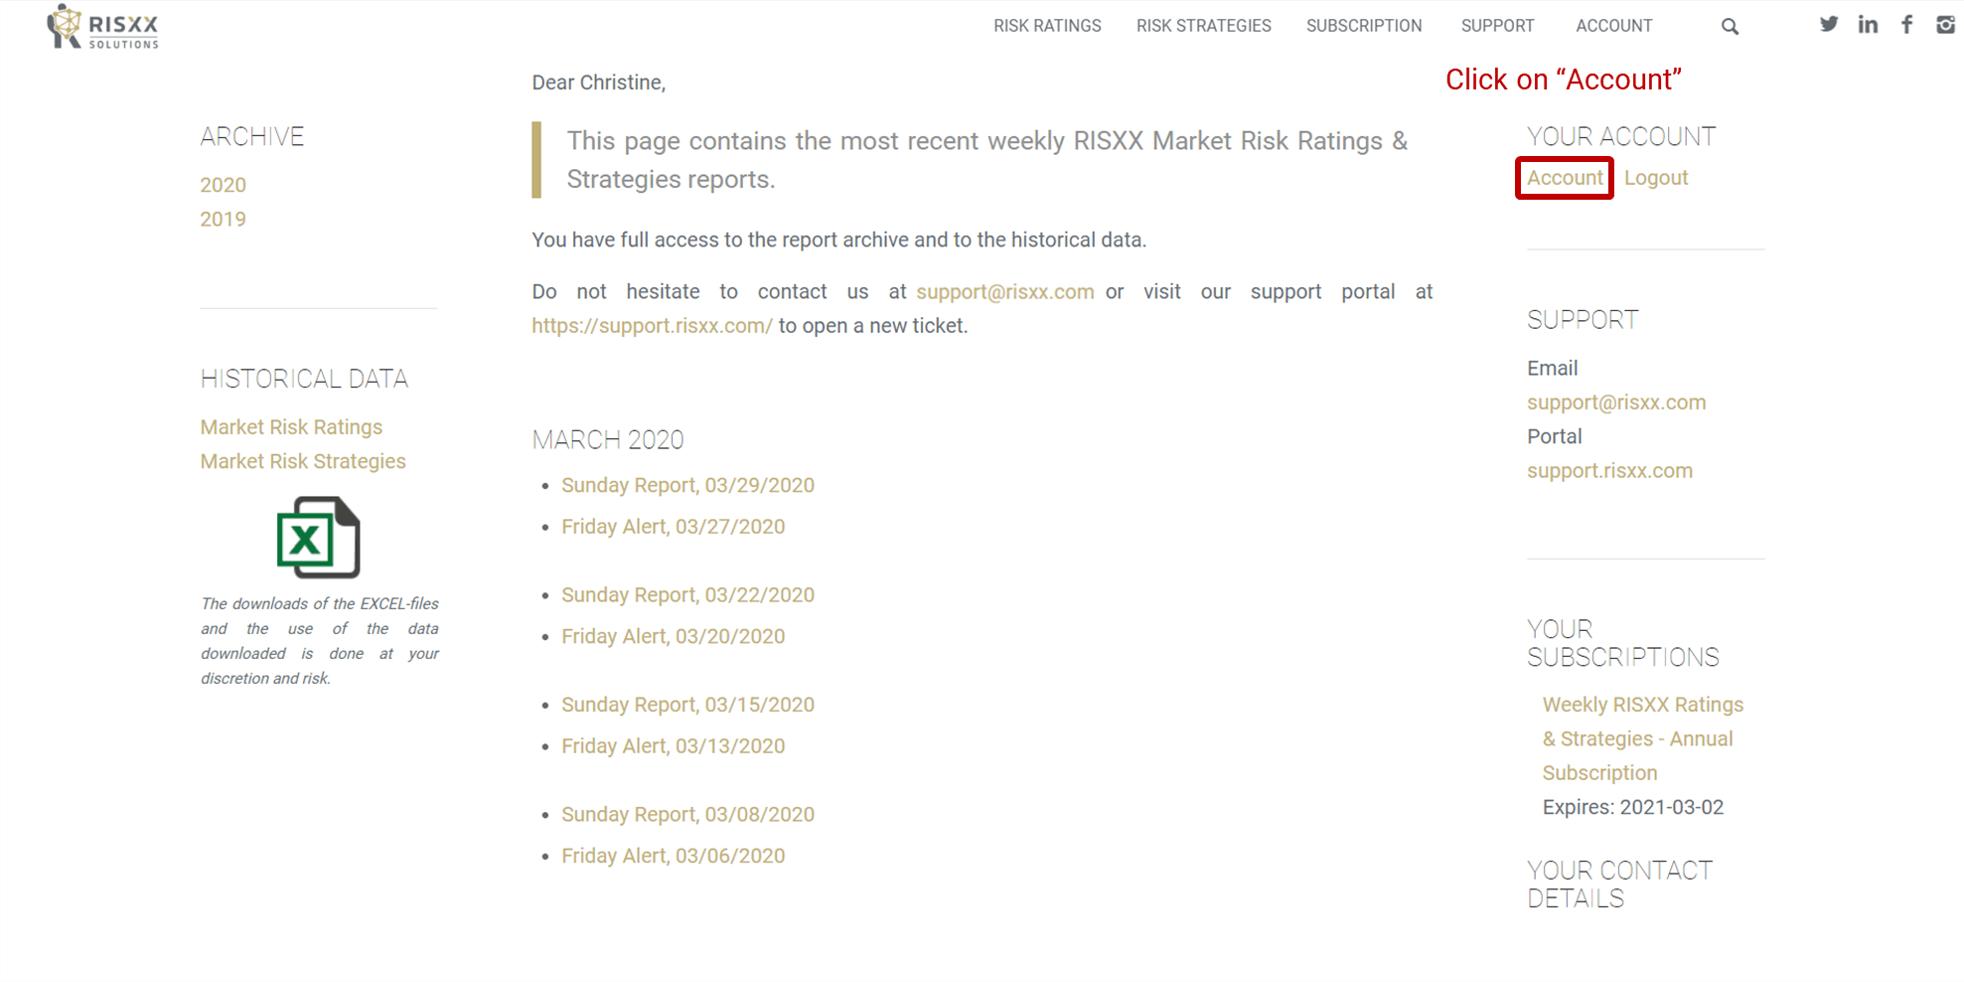 RISXX risk solutions – Update credit card details – access account management